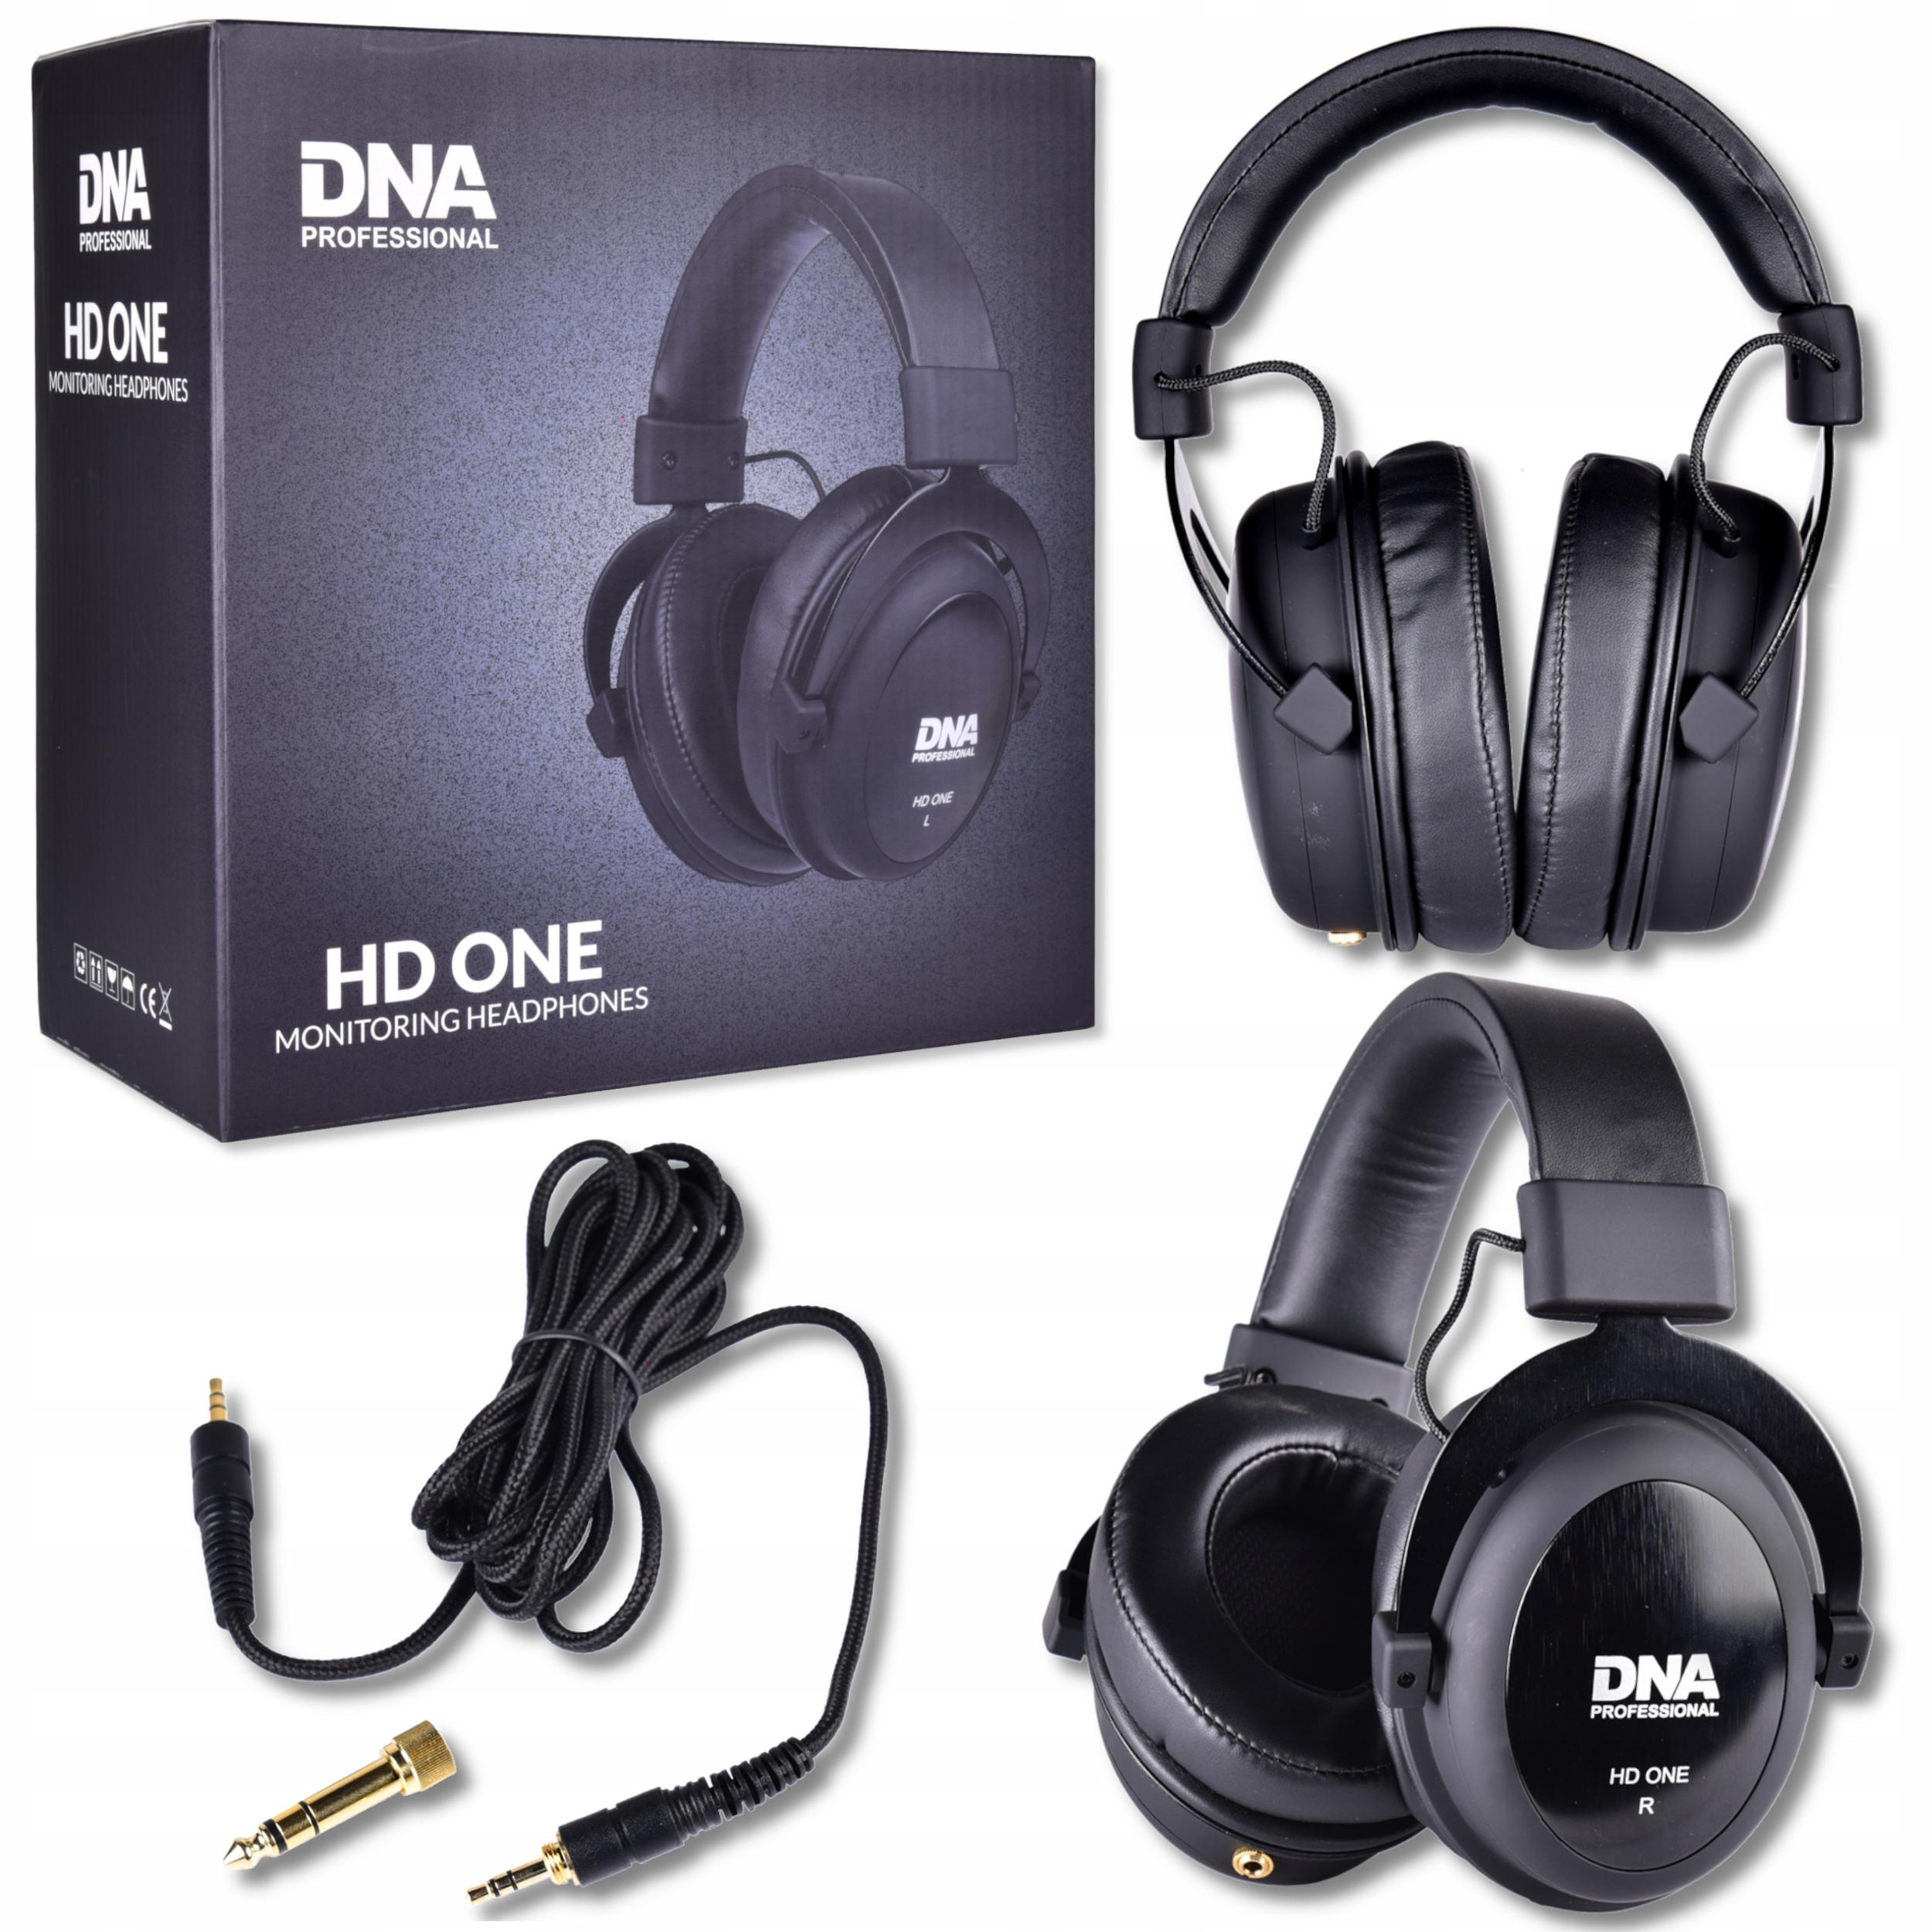 Item DNA HD Studio headphones overhead closed